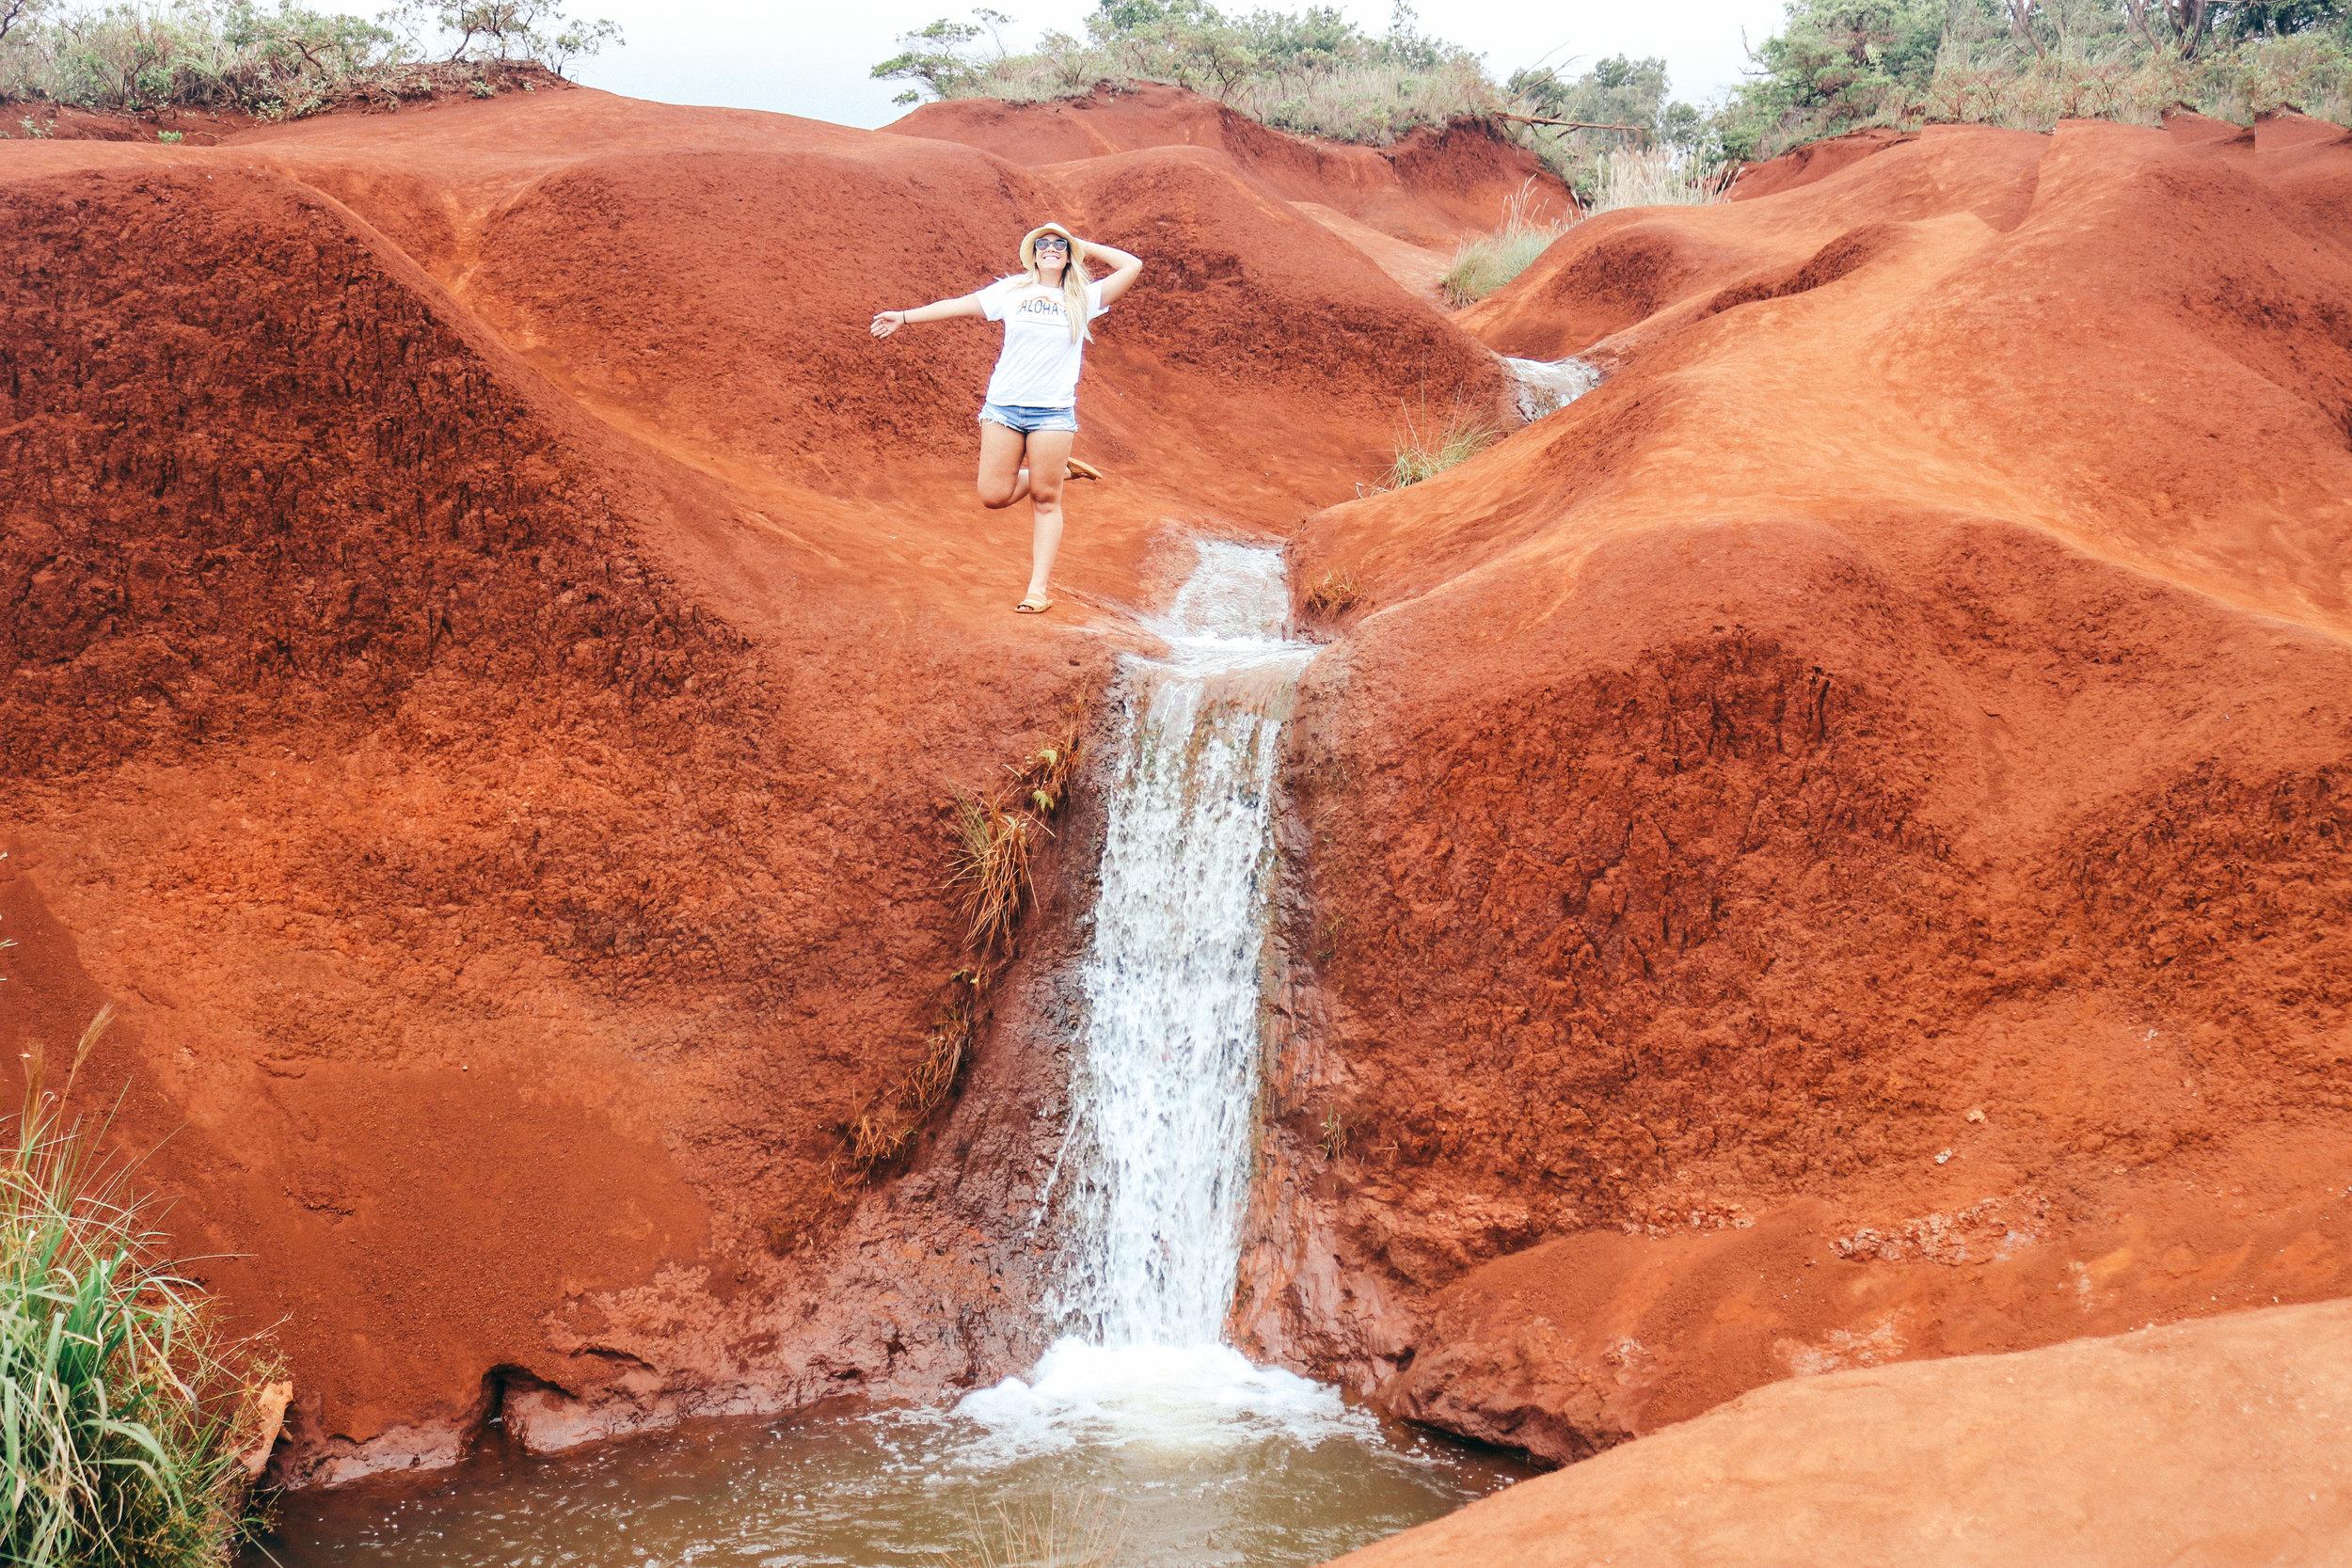 Waimea Canyon, Kauai, Hawaii Adventures, SaltWaterVibes, Red Dirt Waterfall, Kauai Waterfalls, Hawaii